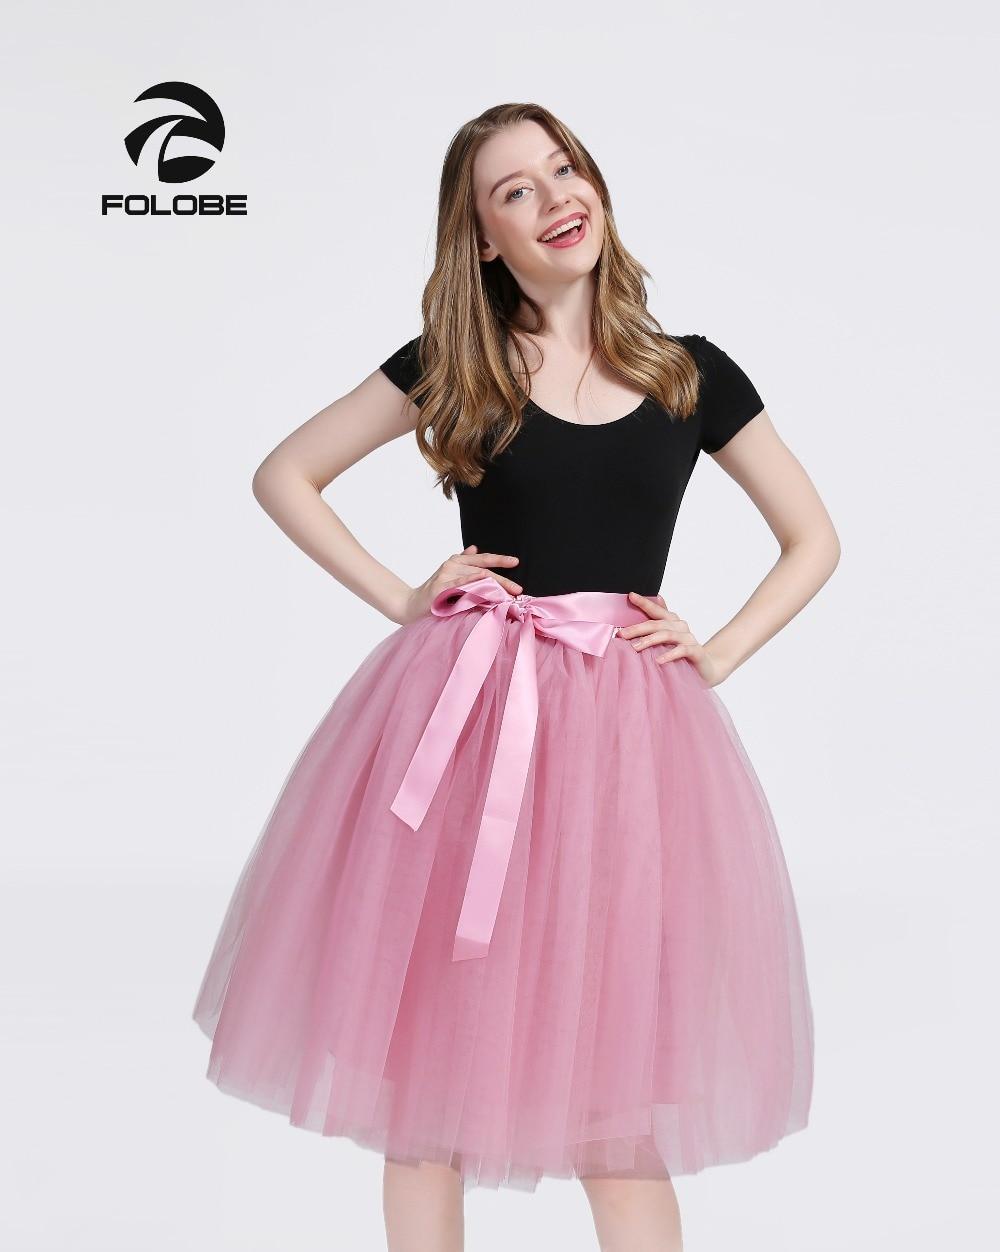 d280d369dd FOLOBE Blush 7 Layers Midi Tulle Skirt Tutu Skirts Womens Petticoat Elastic  Belt faldas saia jupe-in Skirts from Women's Clothing on Aliexpress.com ...